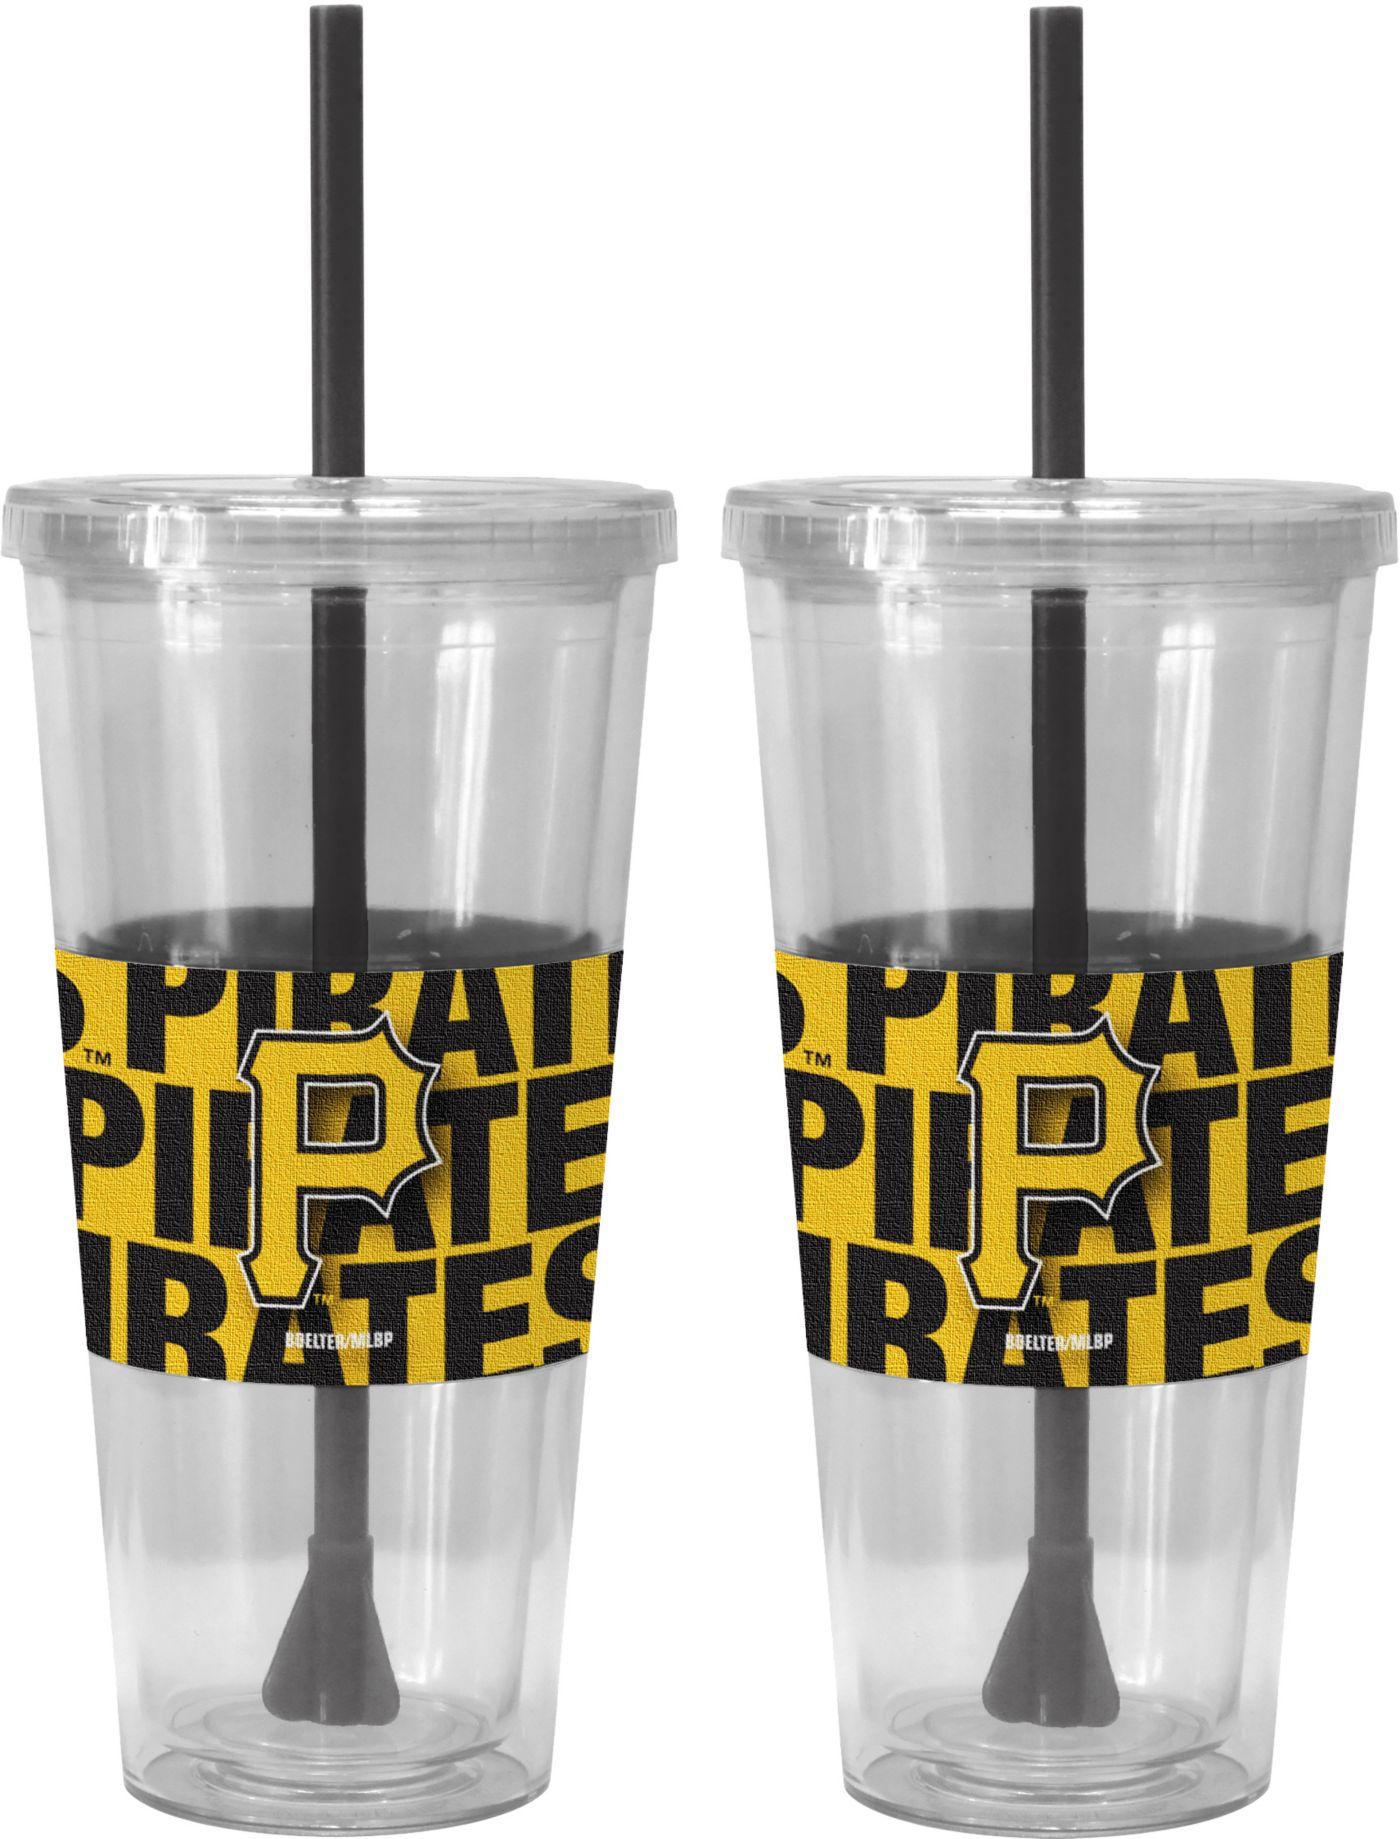 Boelter Pittsburgh Pirates Bold Sleeved 22oz Straw Tumbler 2-Pack